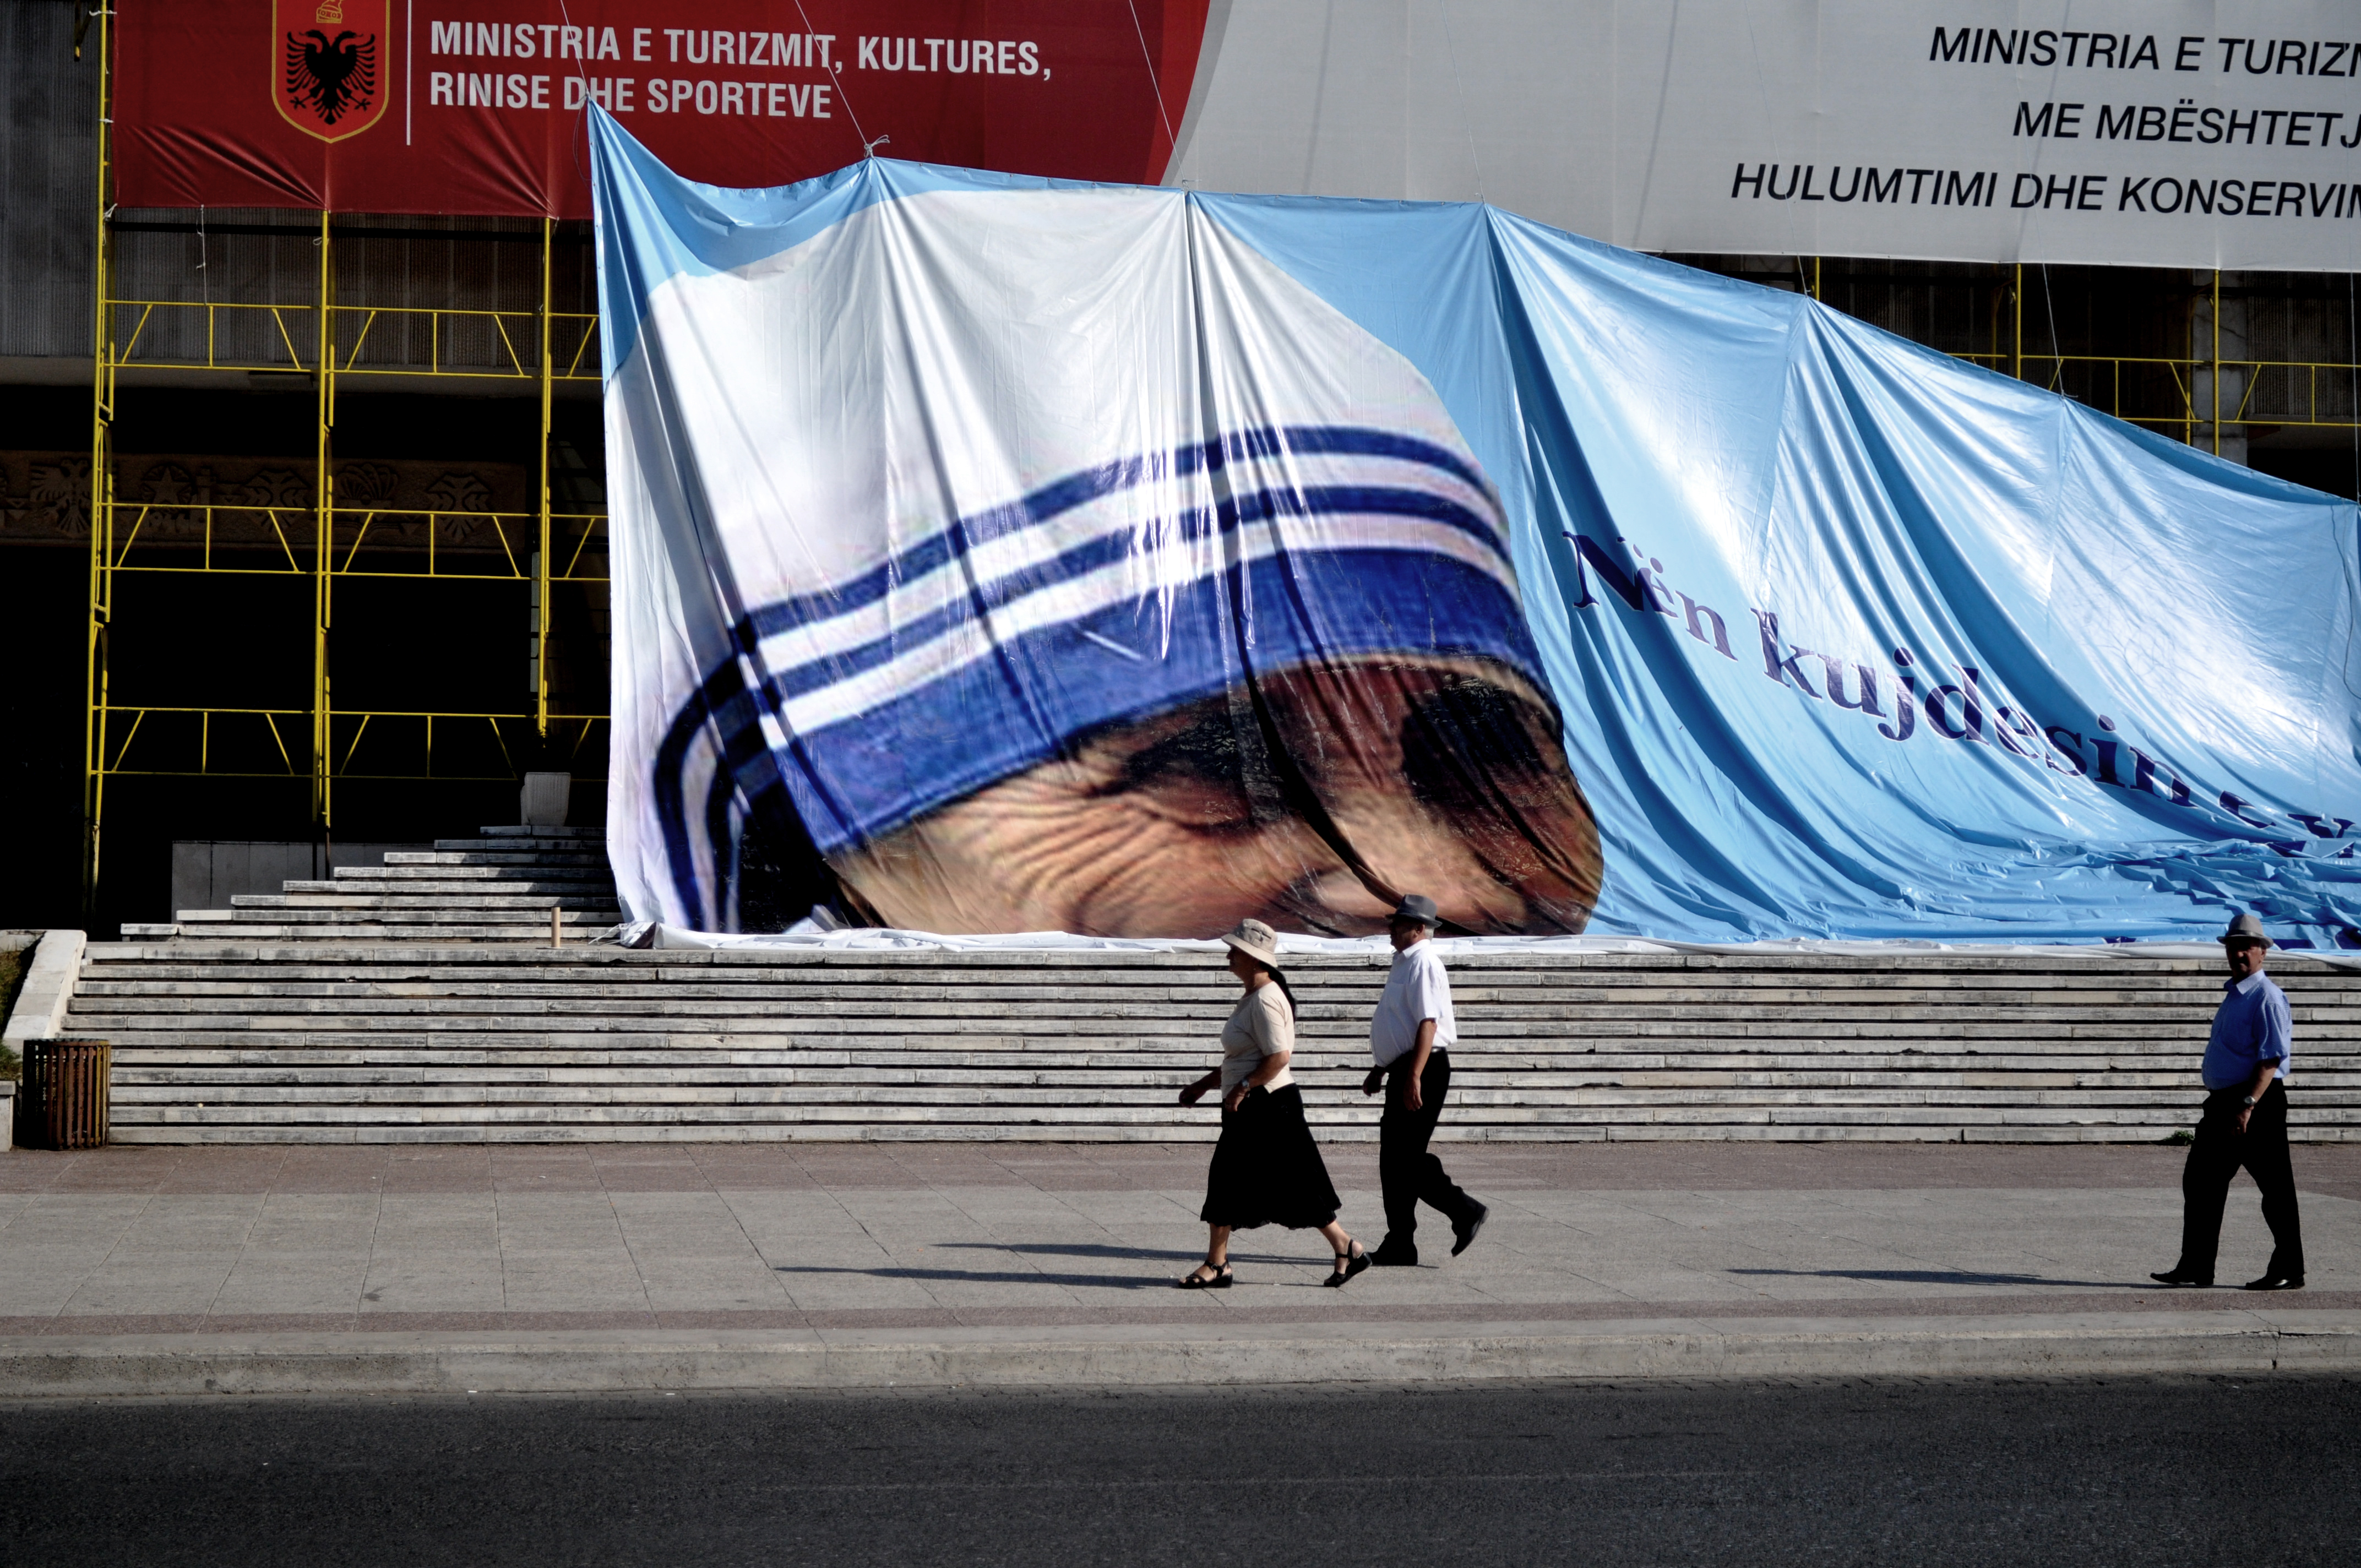 Madre Teresa - foto di Marjola Rukaj